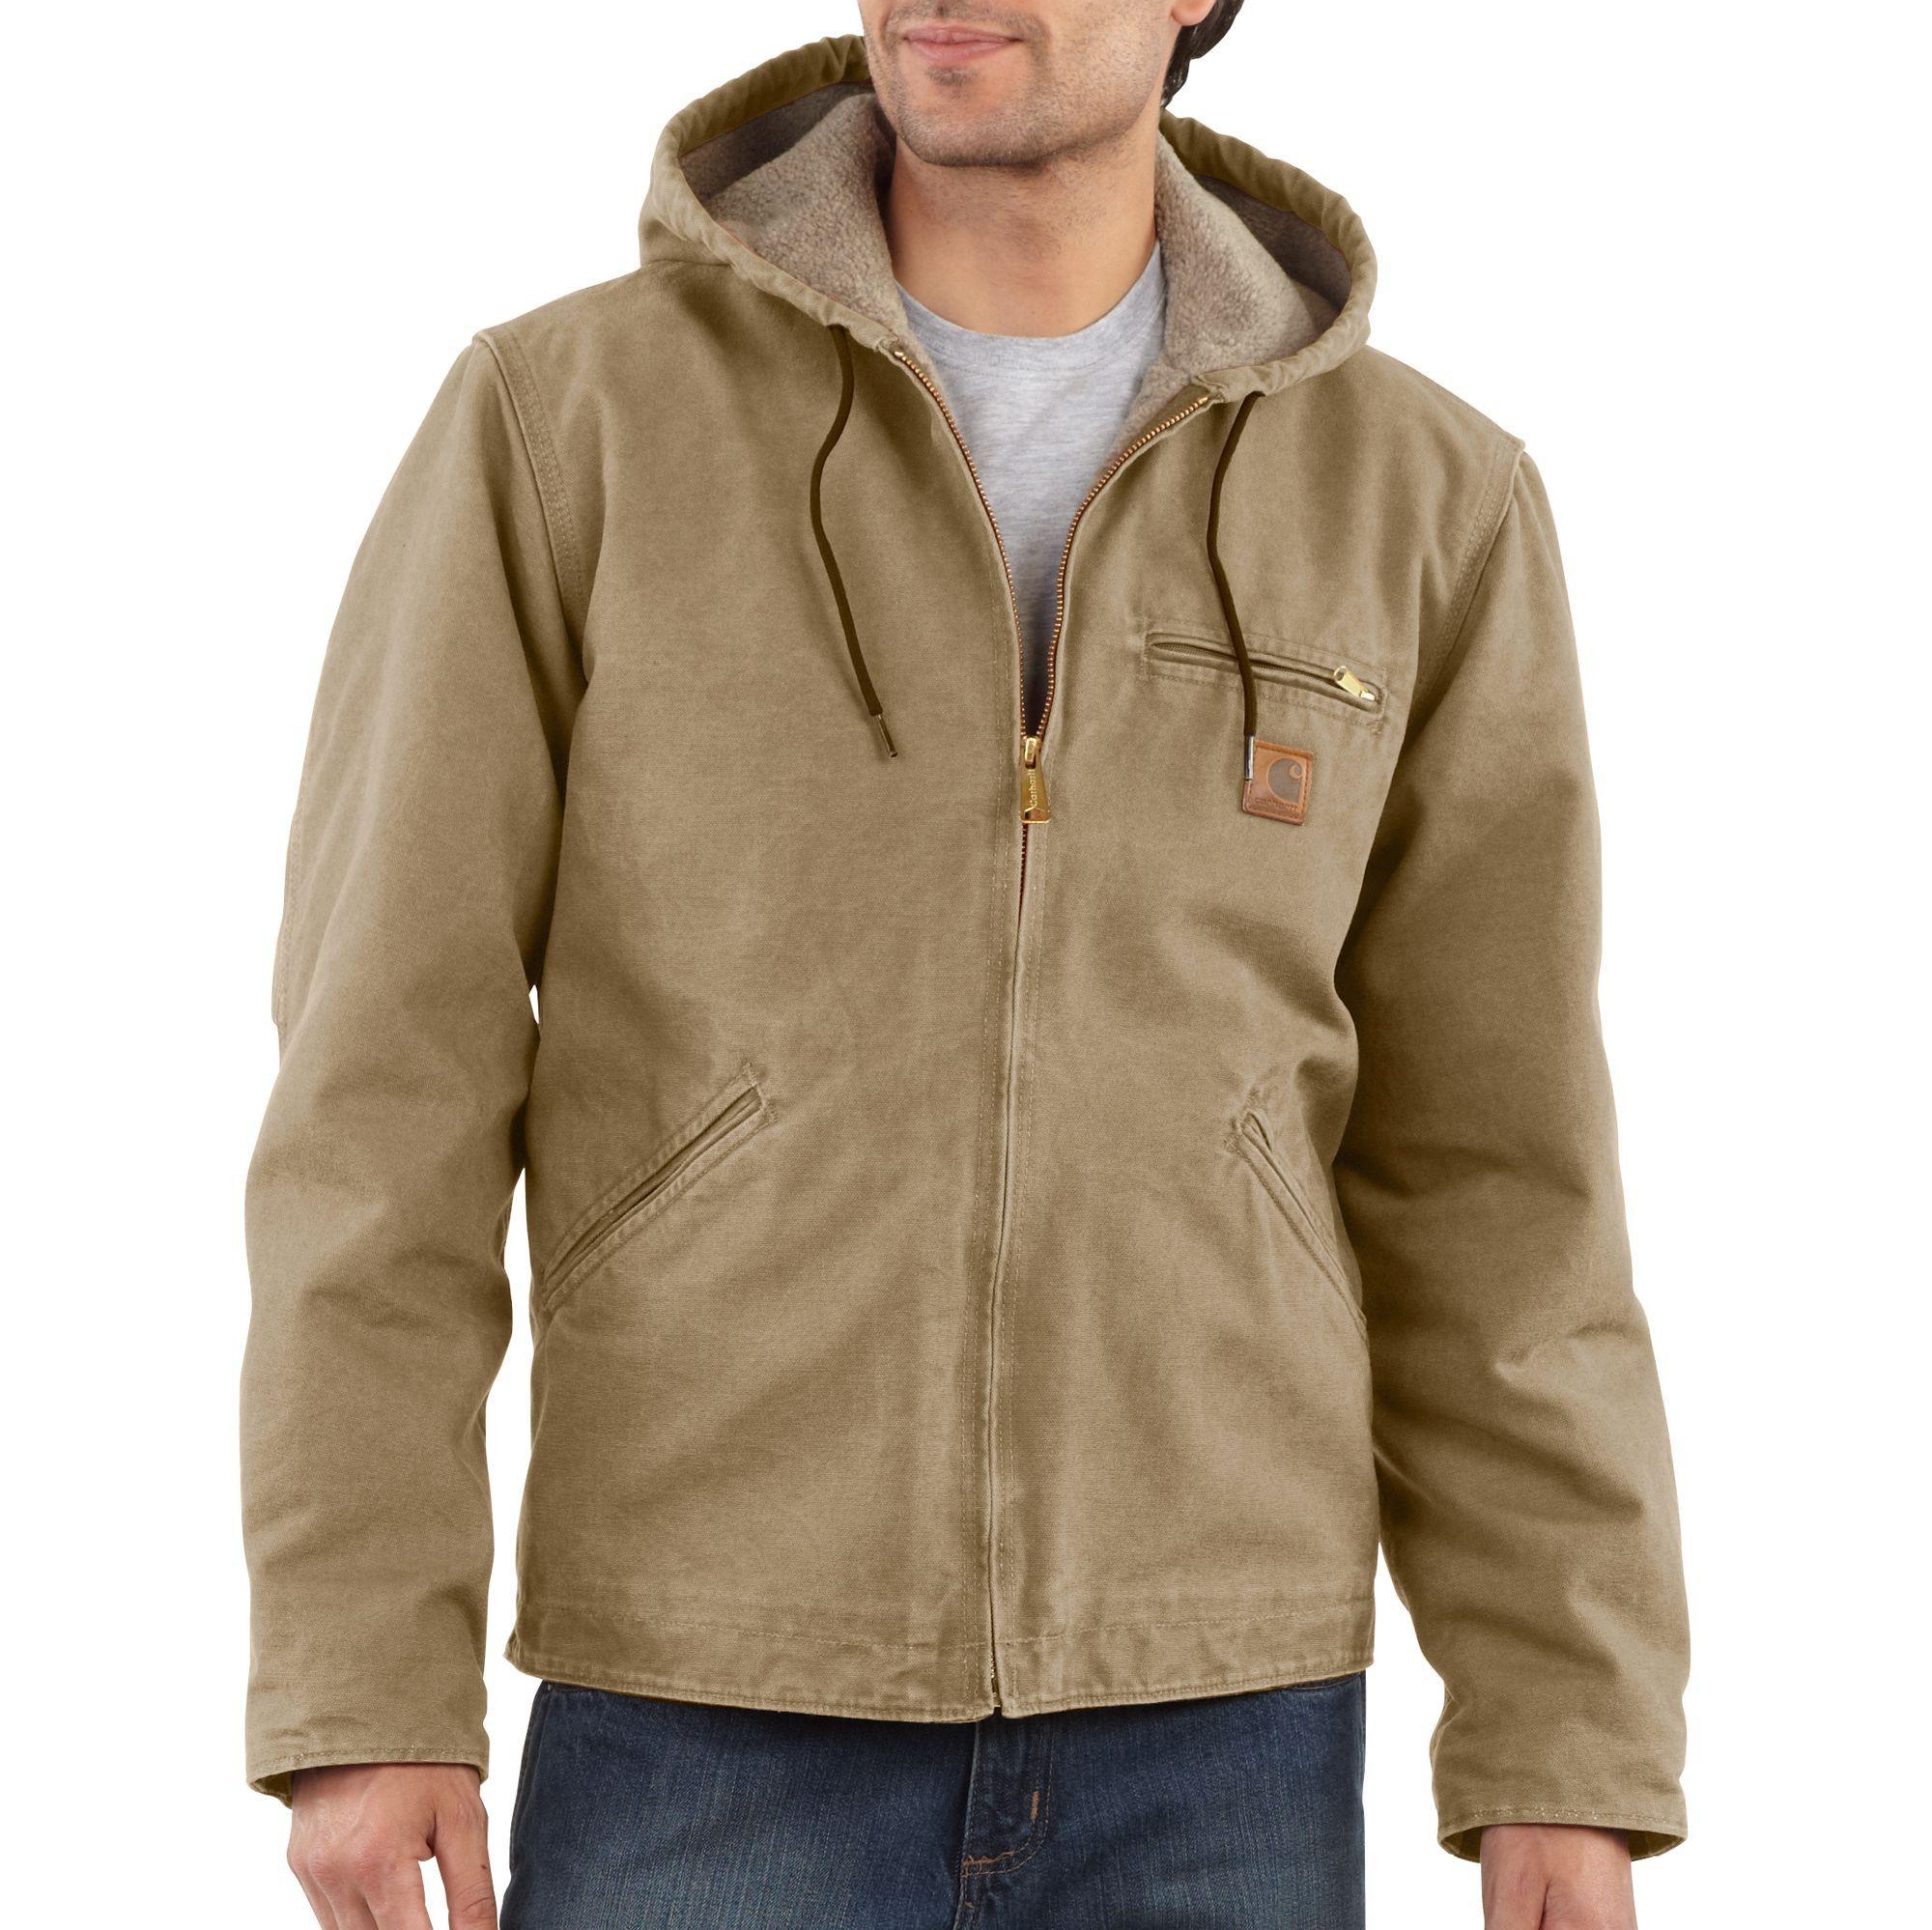 Carhartt Mens Sierra Jacket J141 Cottonwood | Carhartt